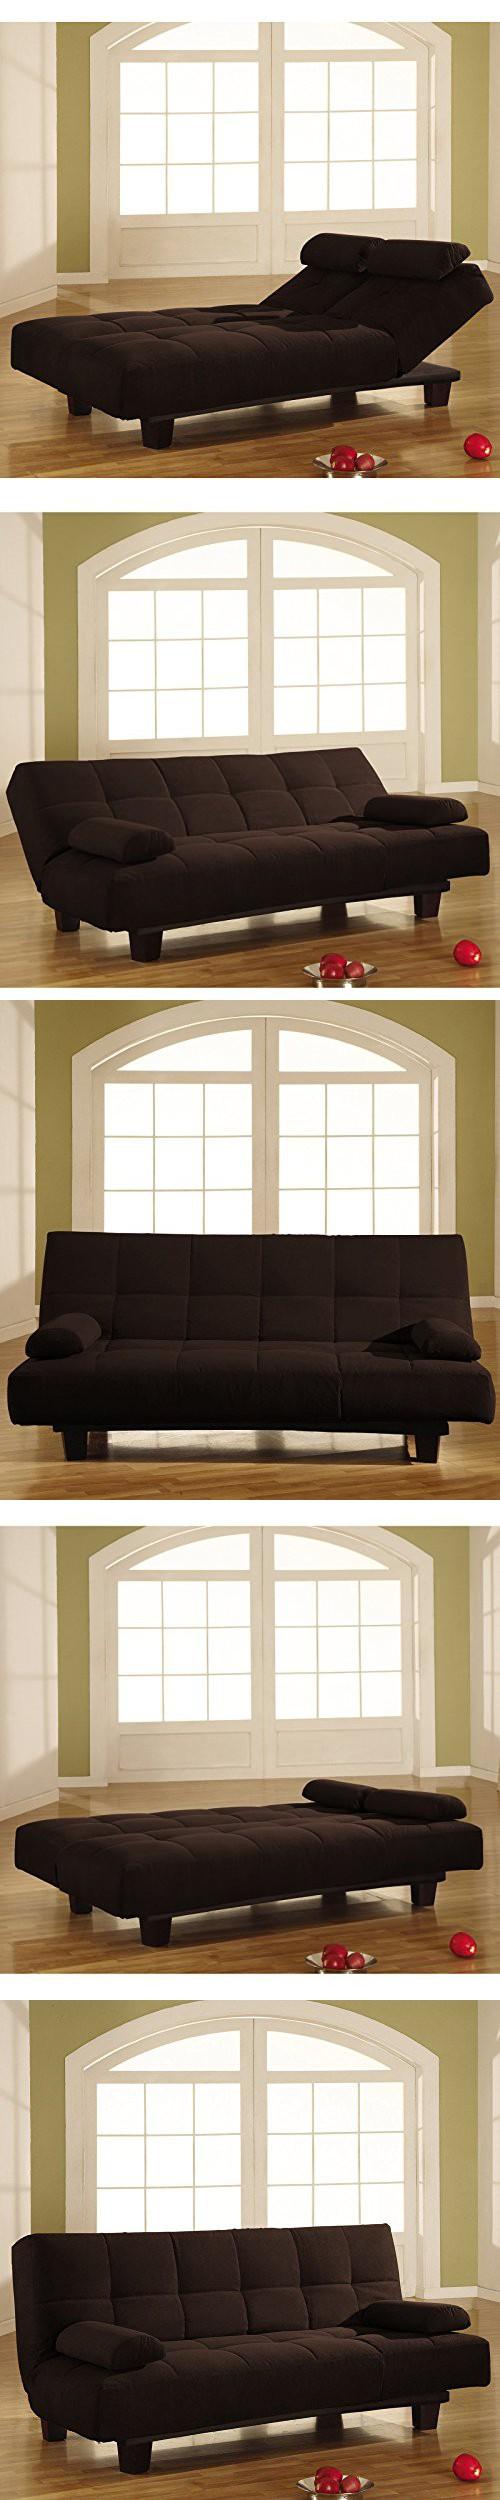 Serta sophia convertible sofa